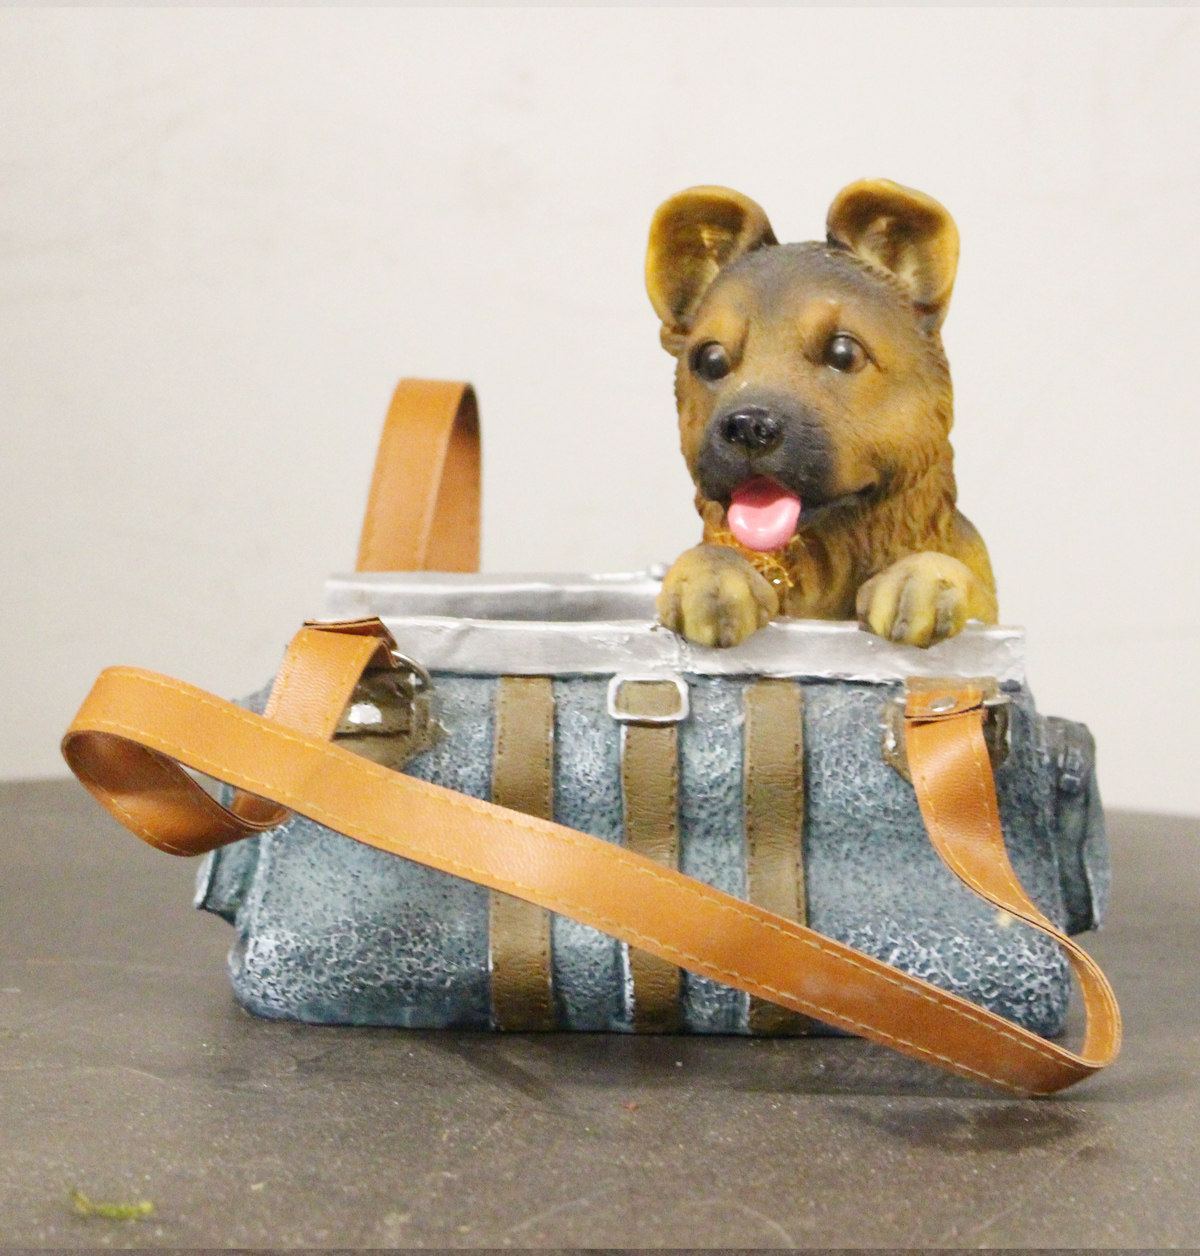 Puppy in handtasche dekor garten for Dekor garten schirrle